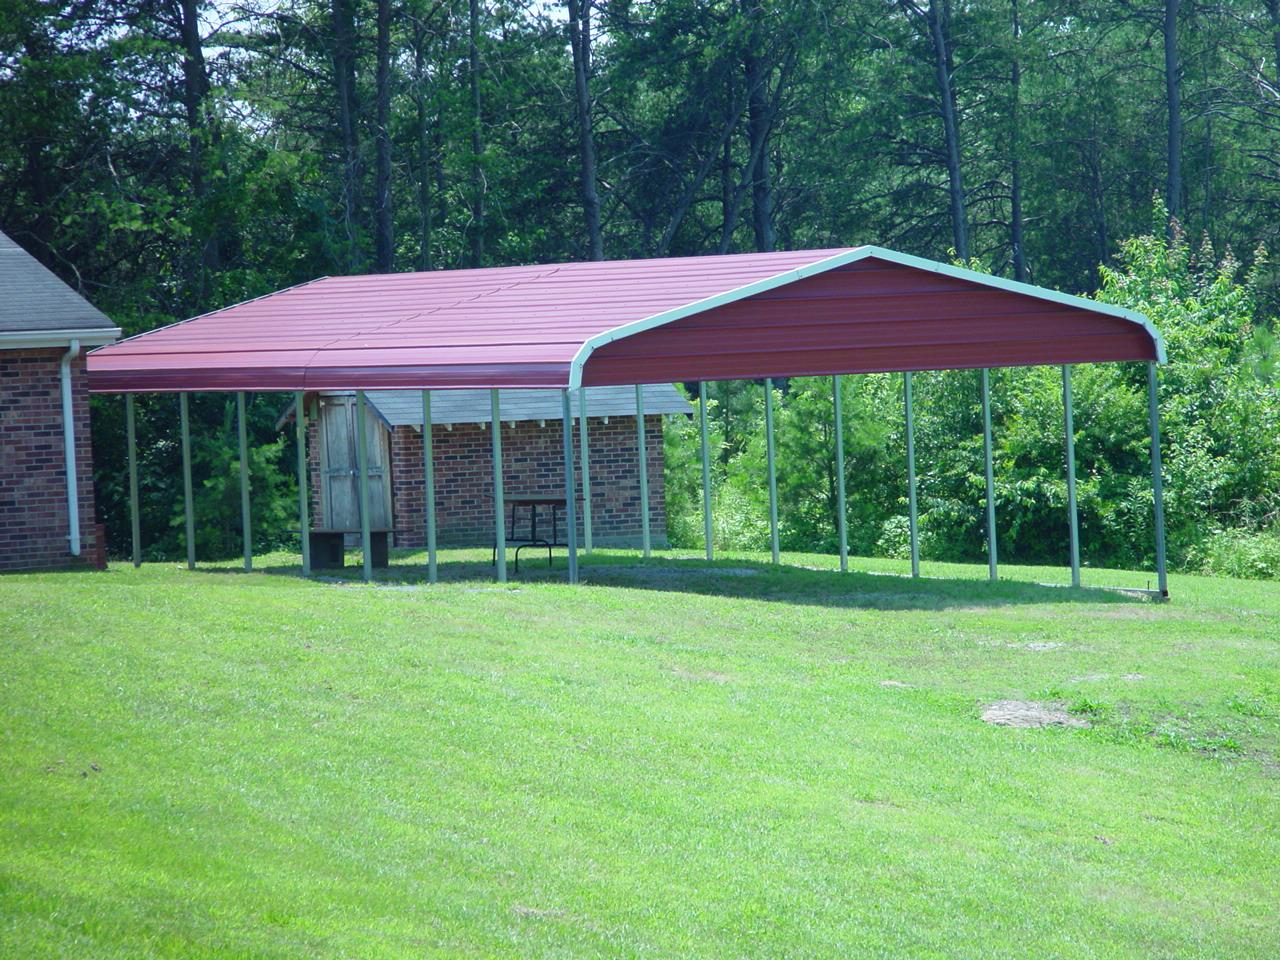 Mobile Home Metal Roof Cover Awning Carport Com